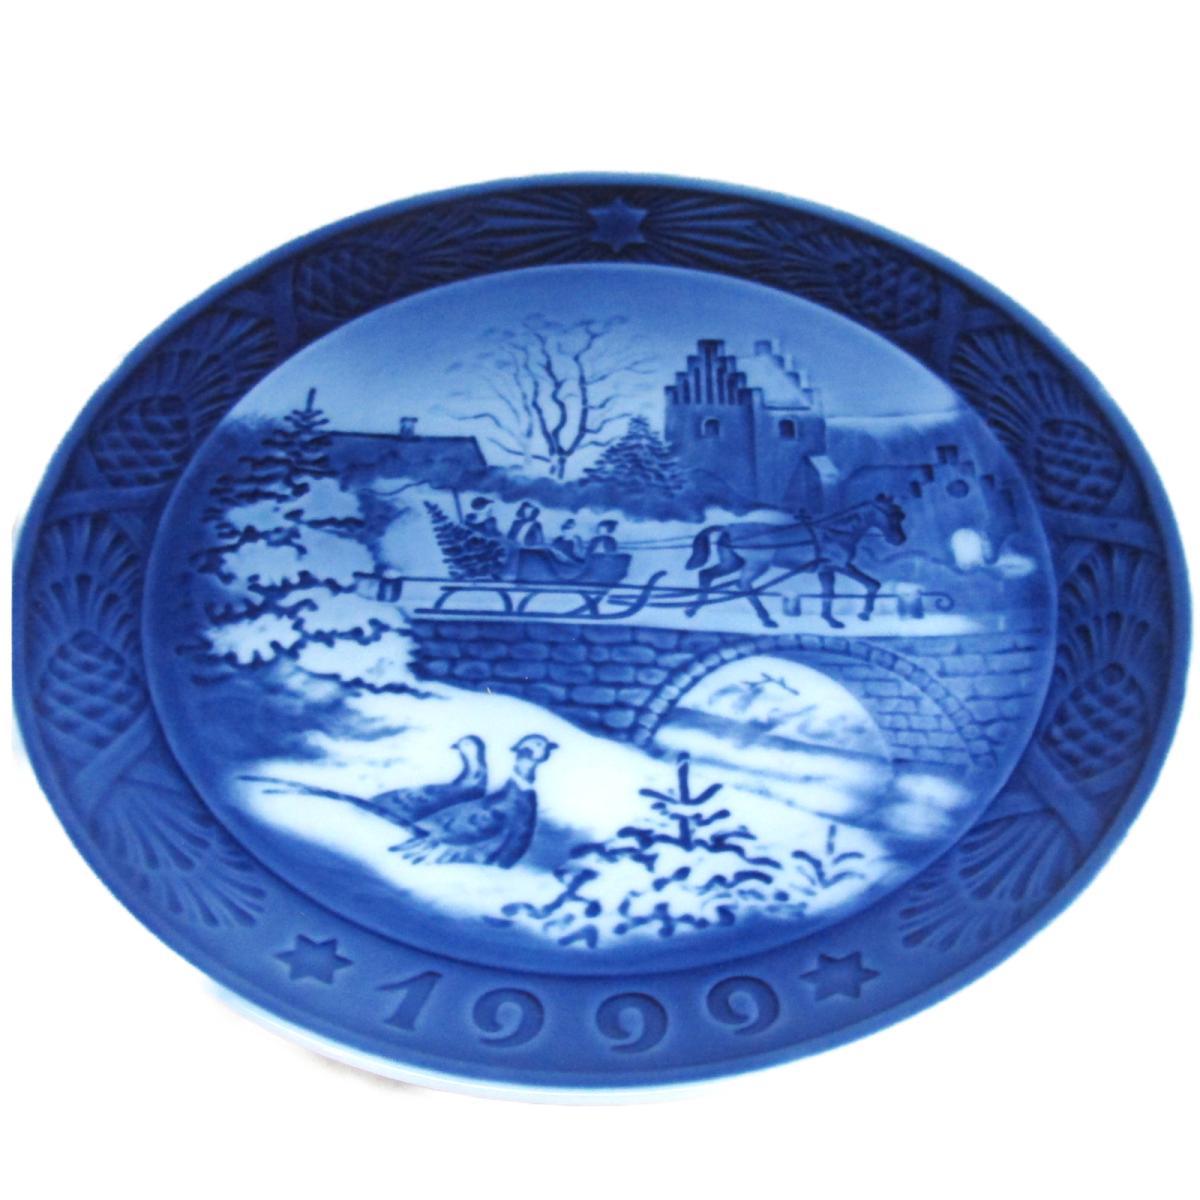 ROYAL COPENHAGEN(ロイヤル・コペンハーゲン)/イヤープレート 1999 絵皿